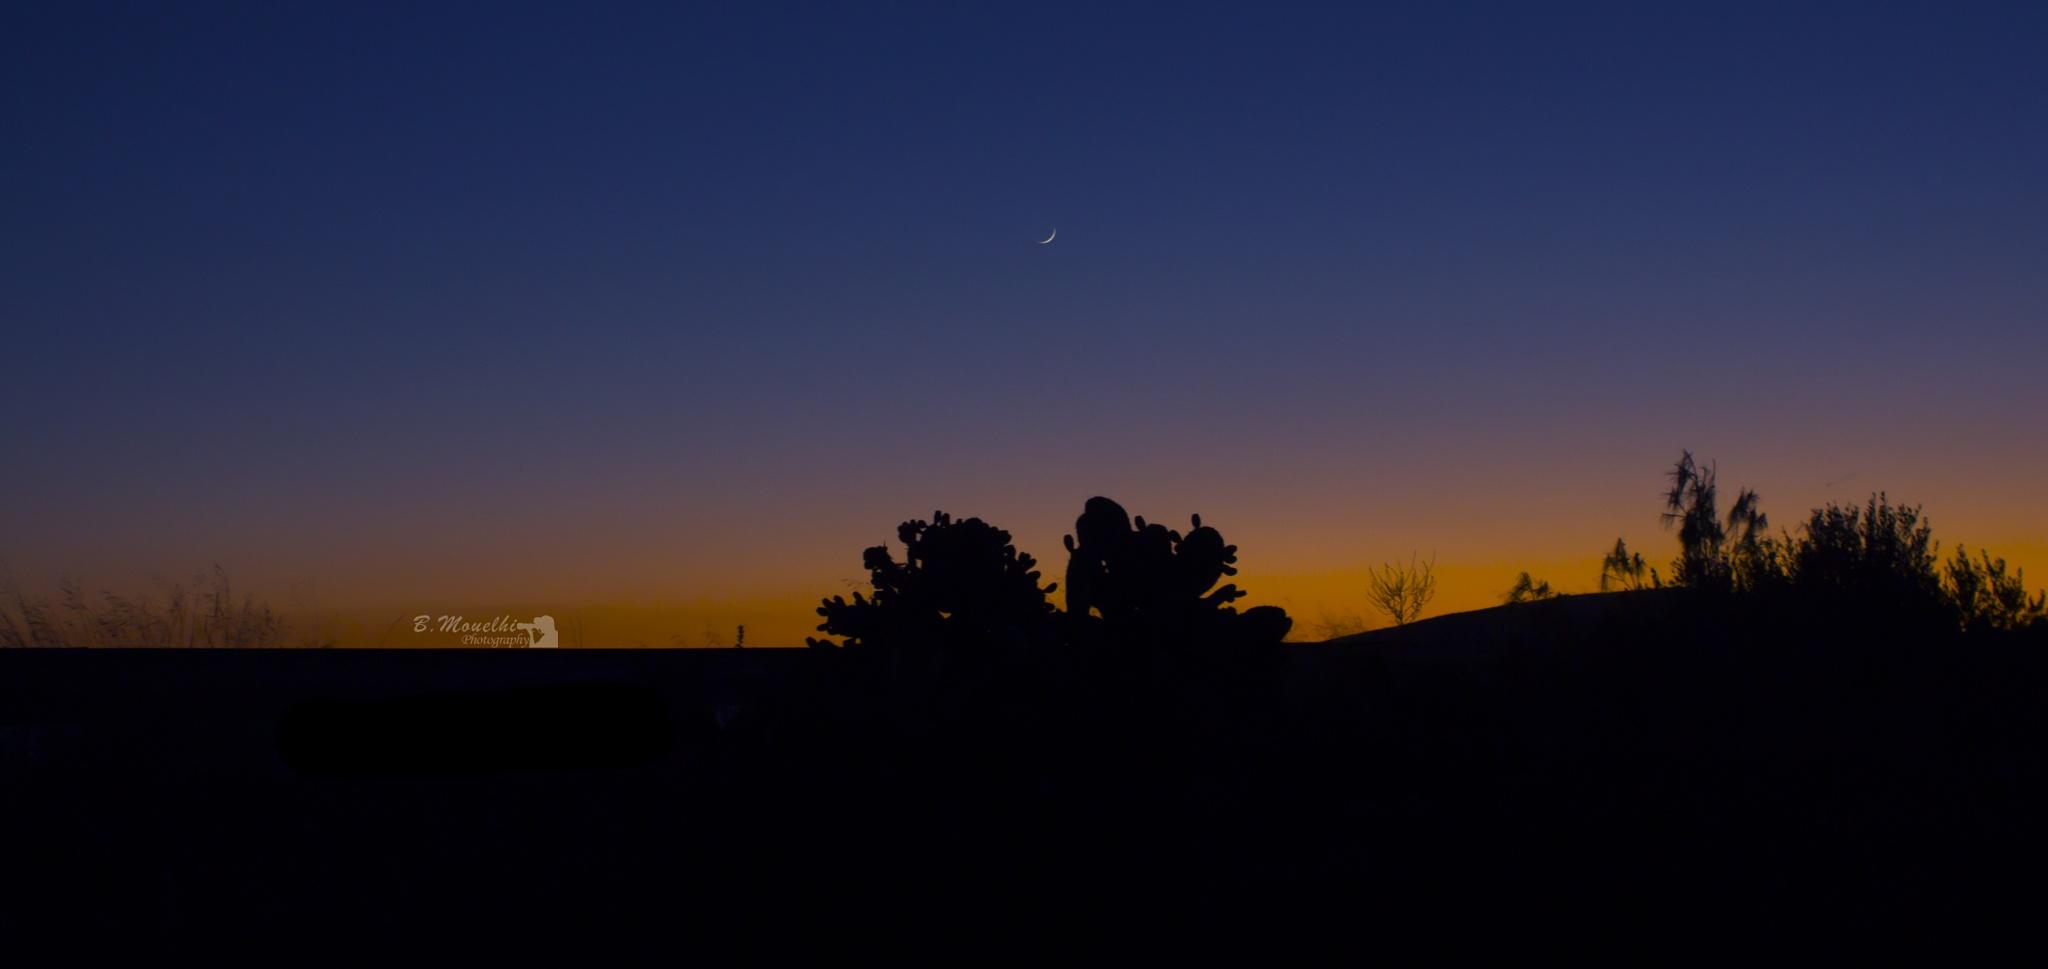 sunset by Mouelhi Badie